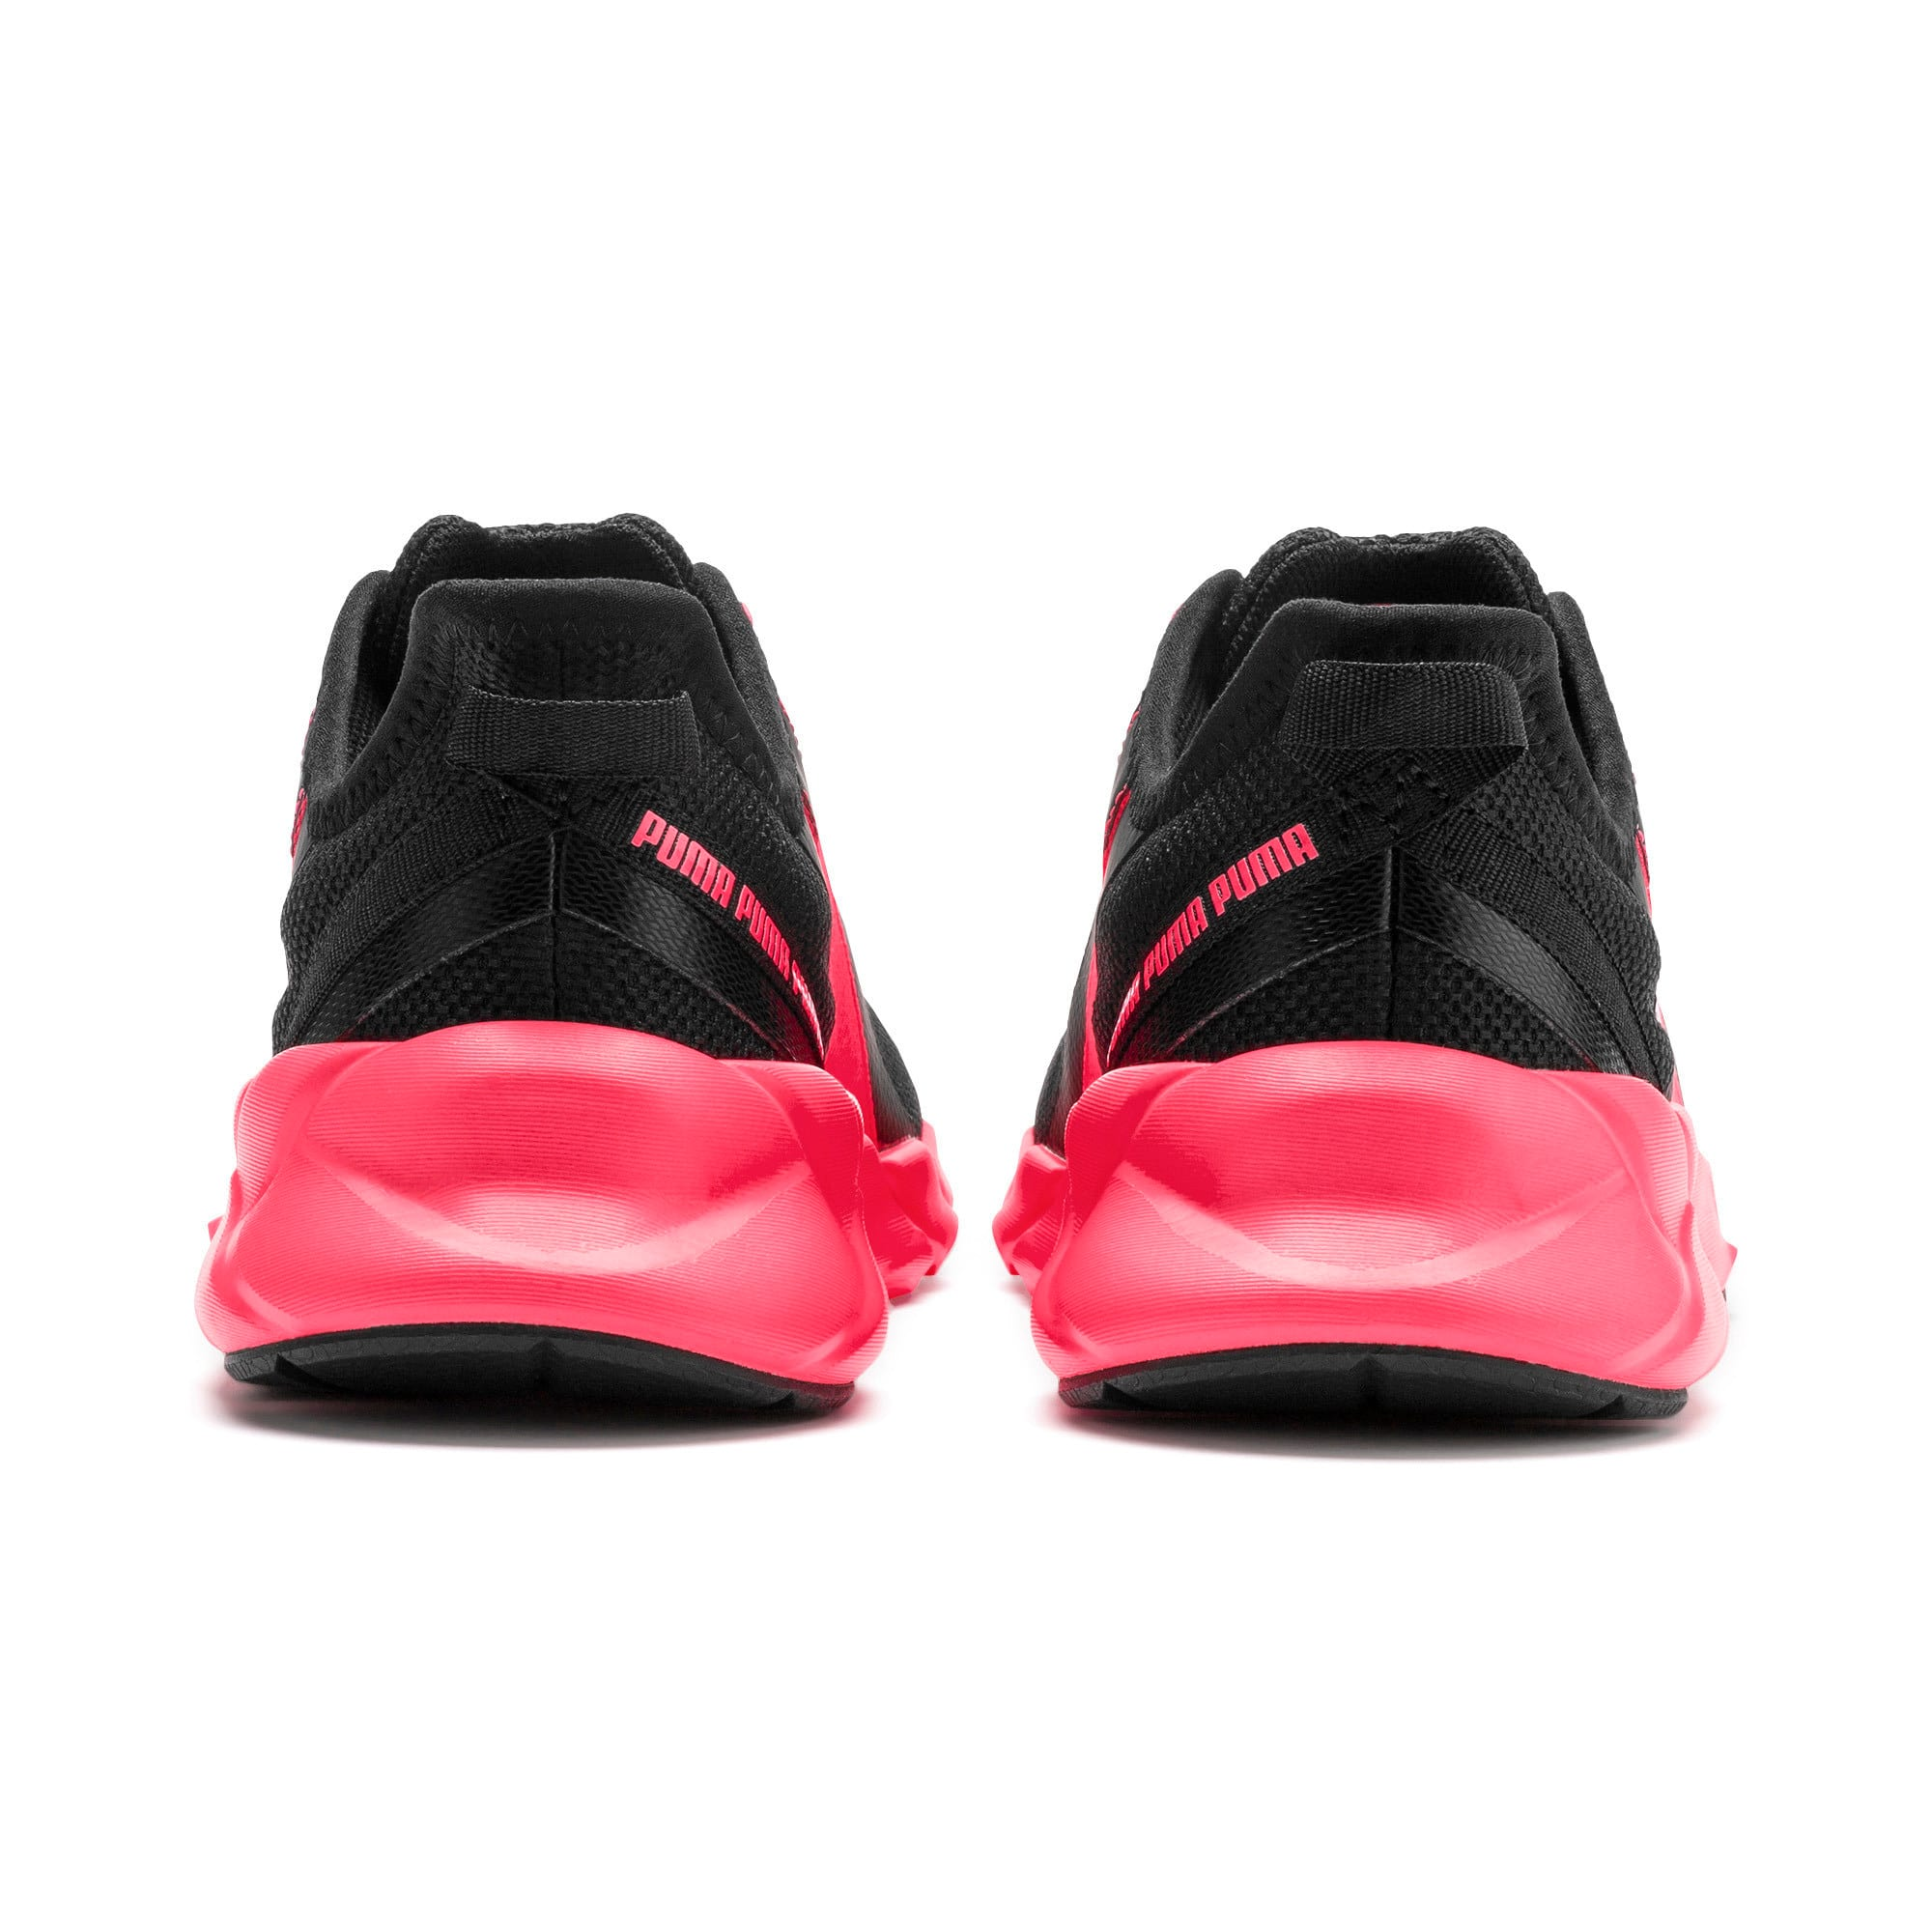 Thumbnail 4 of Weave XT Women's Training Shoes, Puma Black-Pink Alert, medium